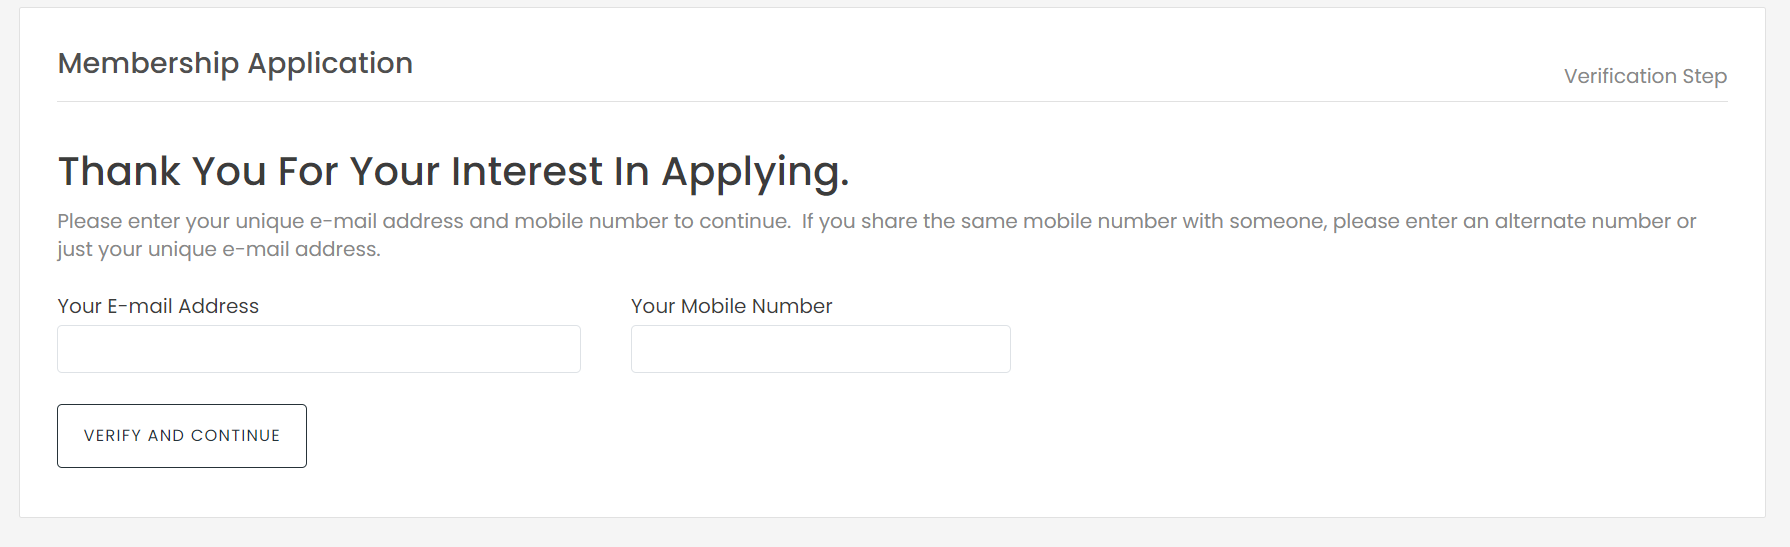 Verify an Applicant hasn't Already Applied Before Continuing - Avoid Data Overlap photo